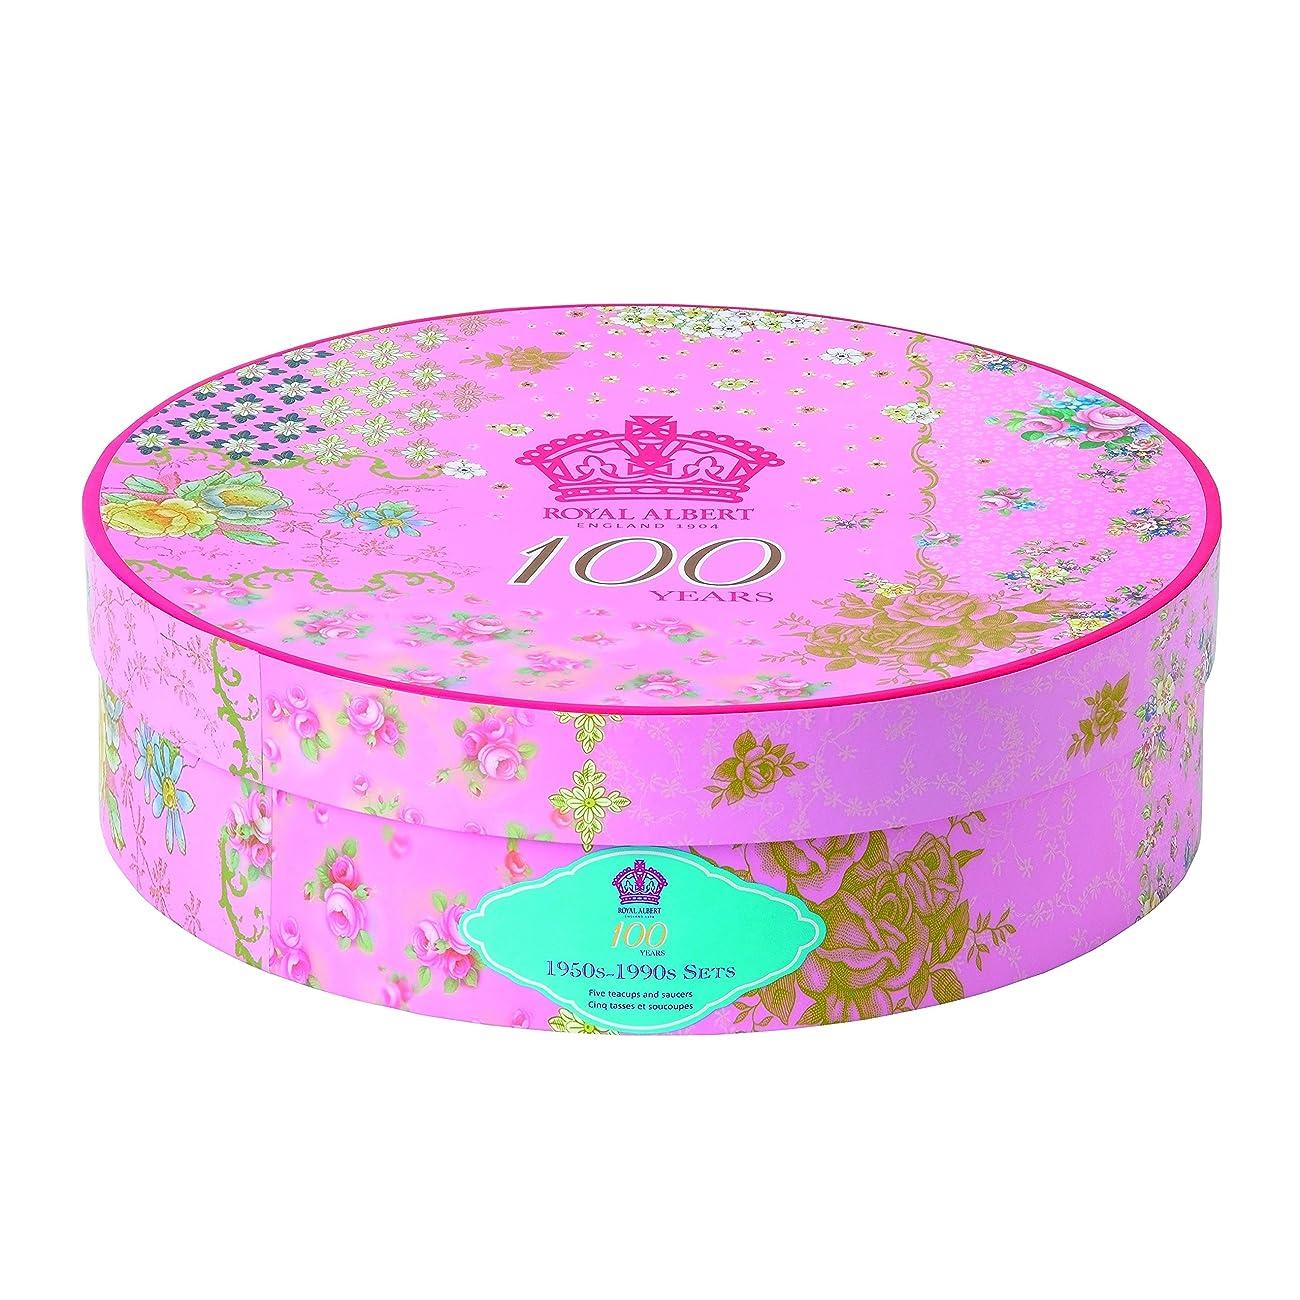 Royal Albert 5 Piece 100 Years 1950-1990 Teacup & Saucer Set, Multicolor 3